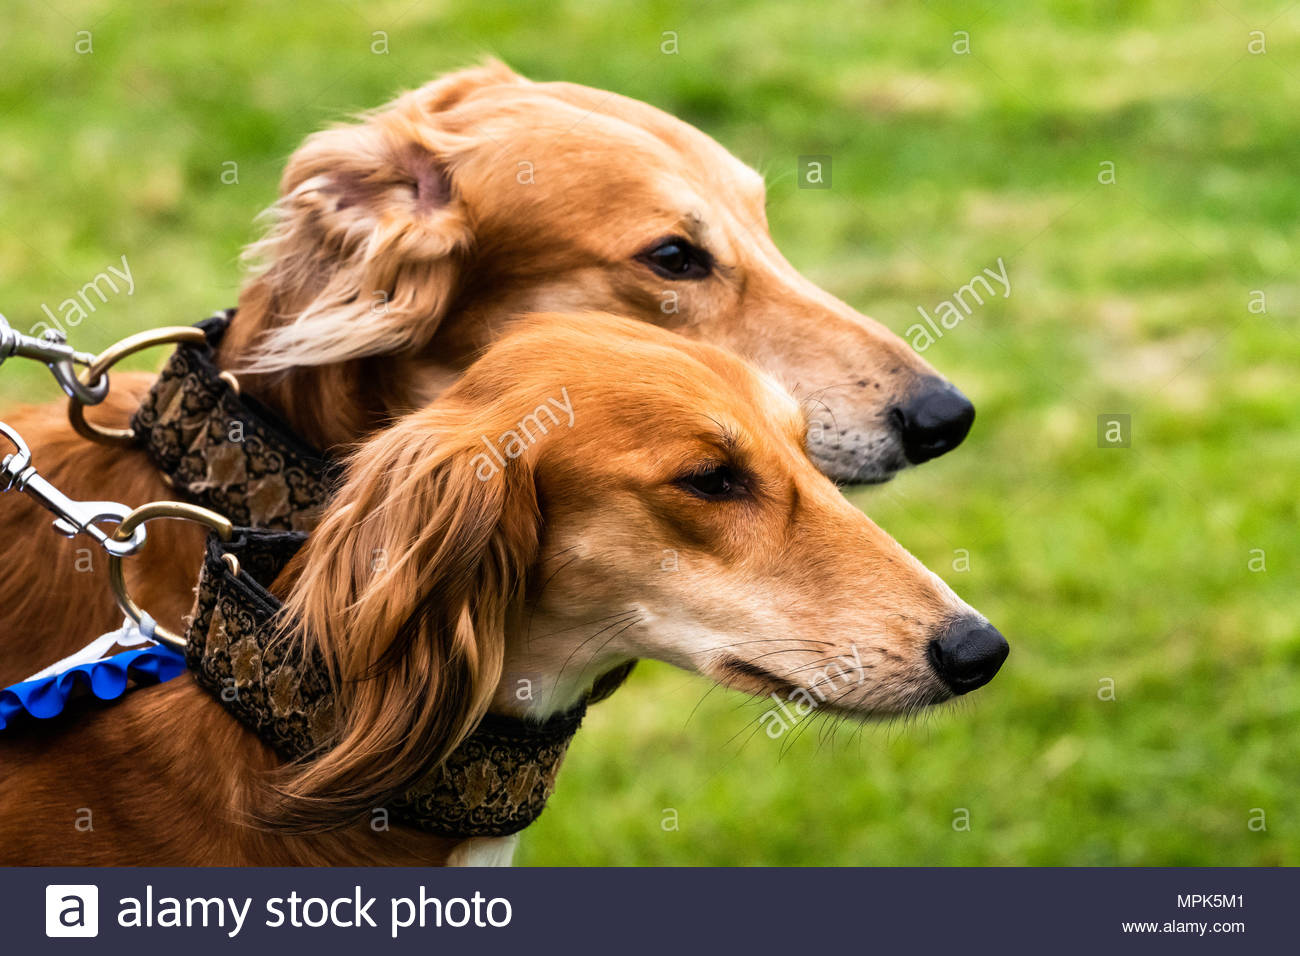 Saluki Greyhound Lurcher Stock Photos & Saluki Greyhound